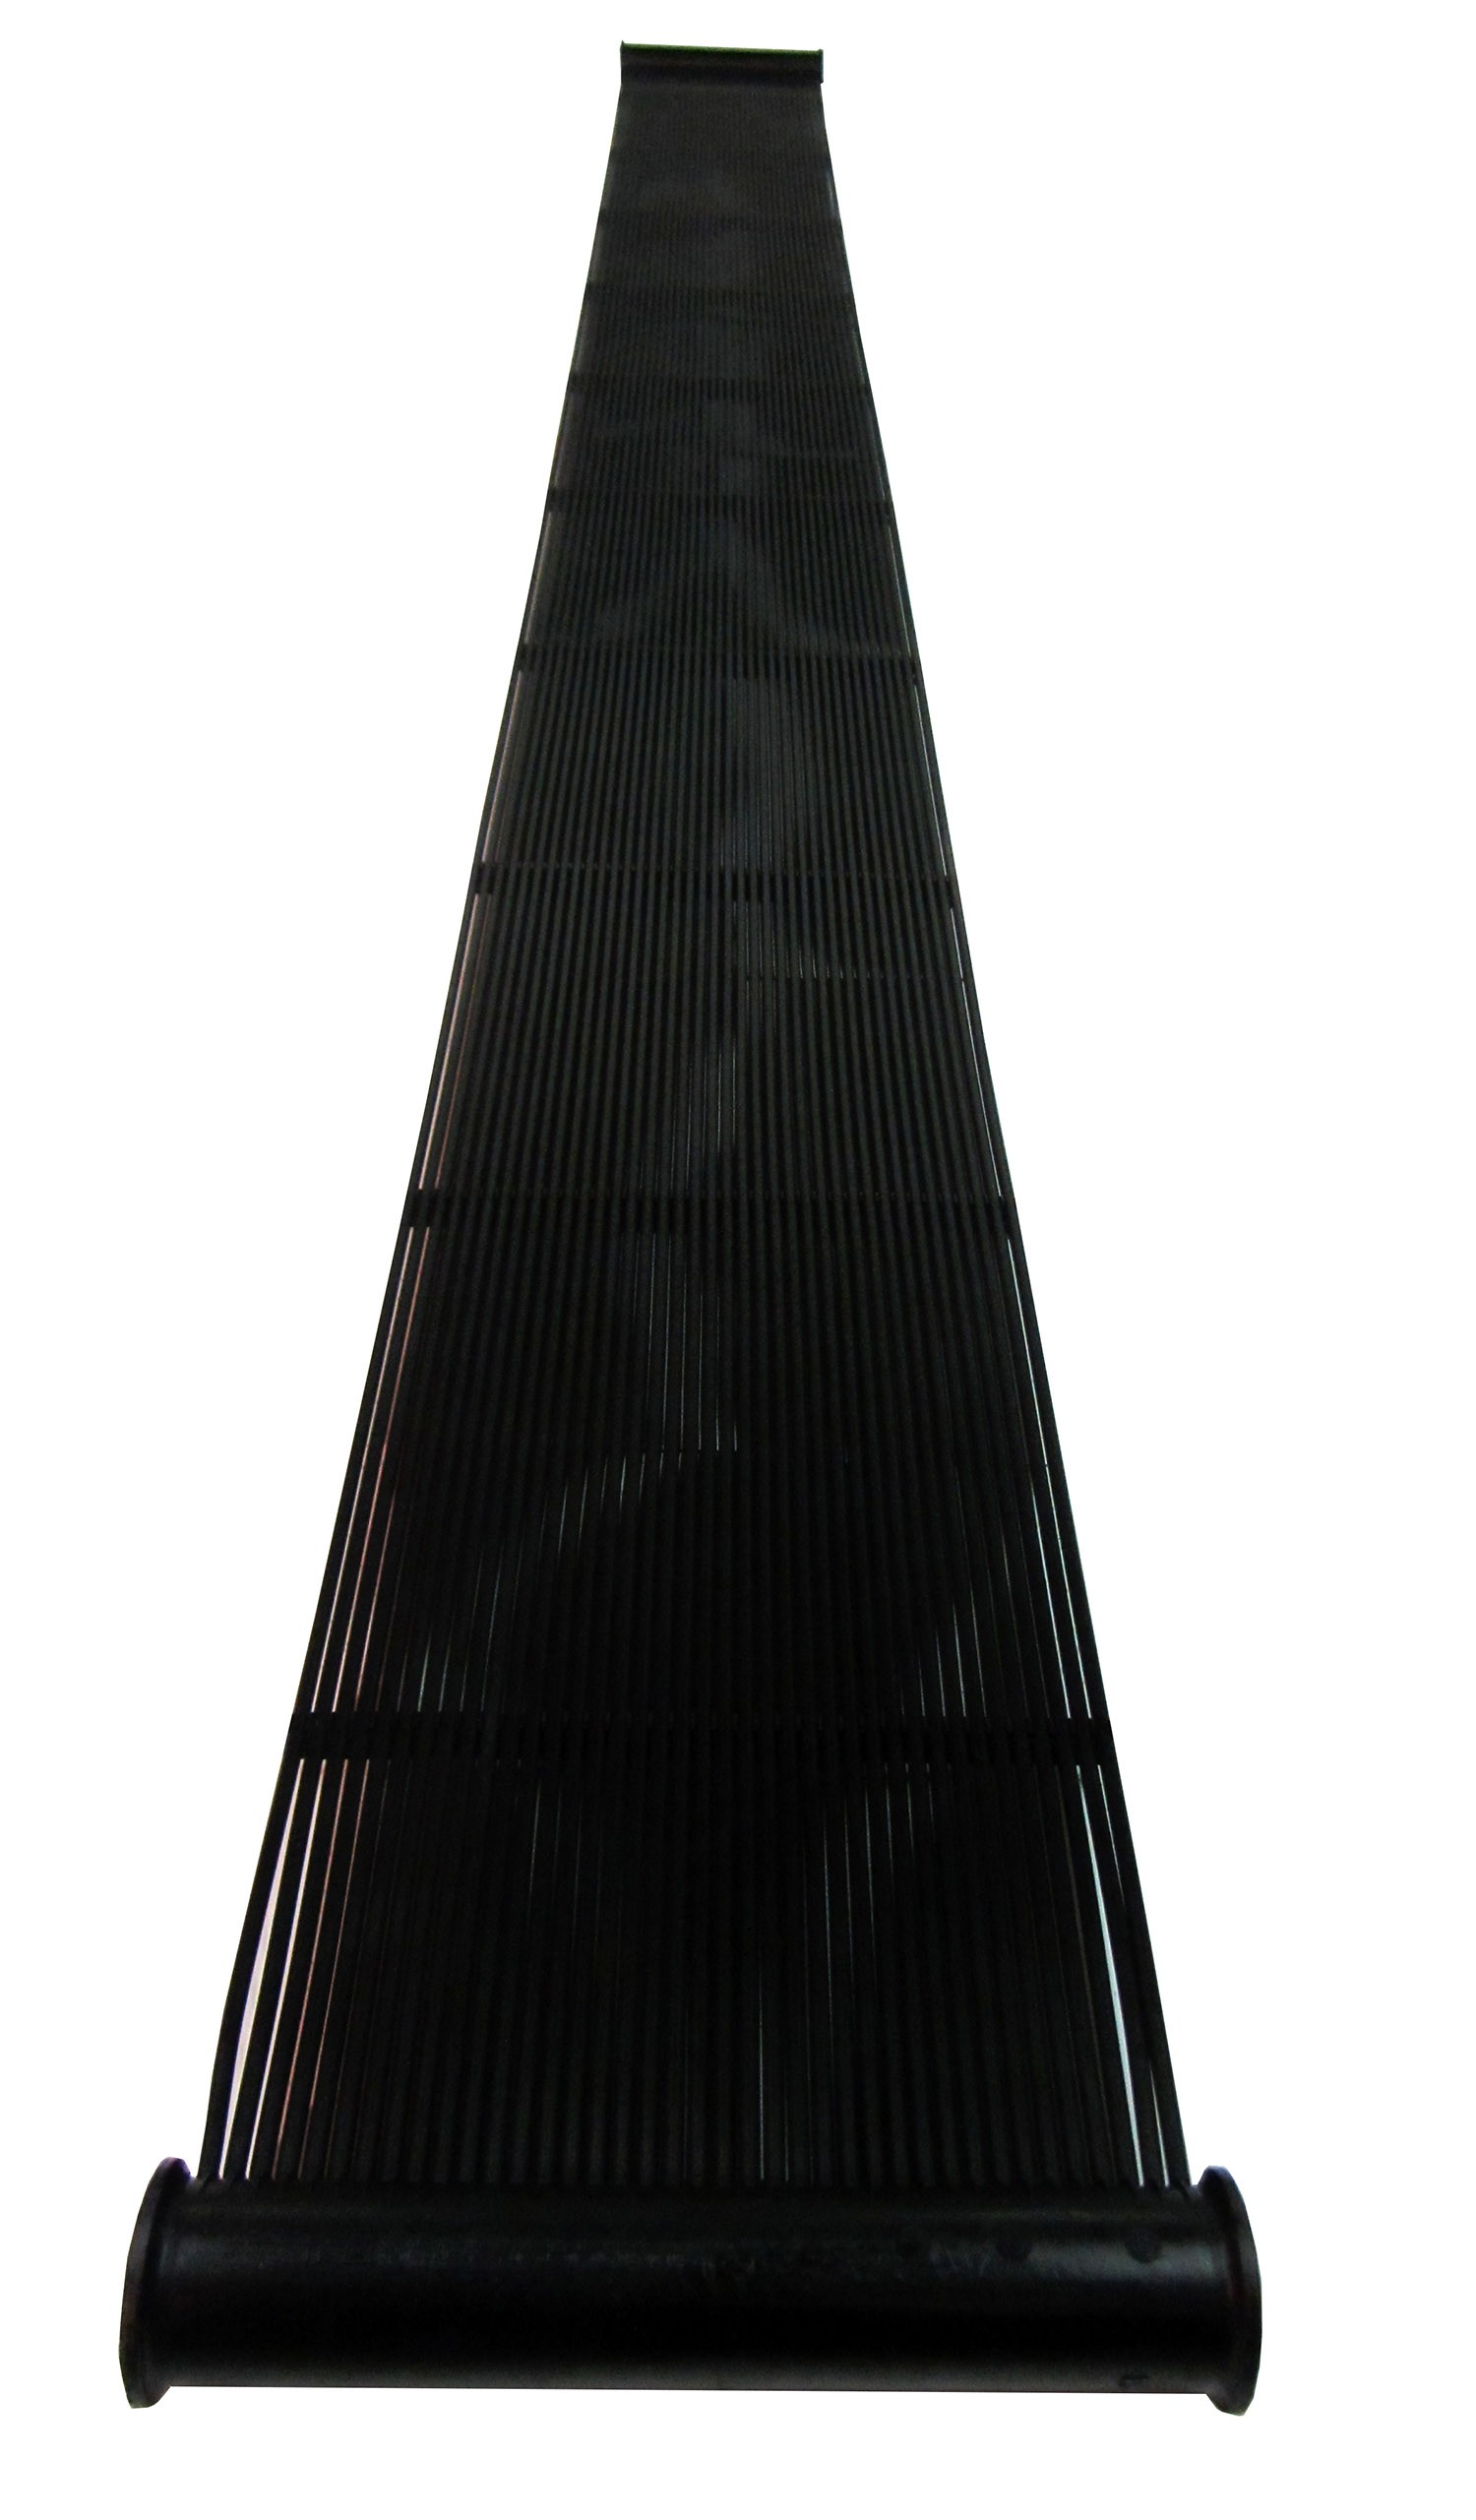 Heliocol Swimming Pool Solar panel 1' x 12' 6 - HC-12.5